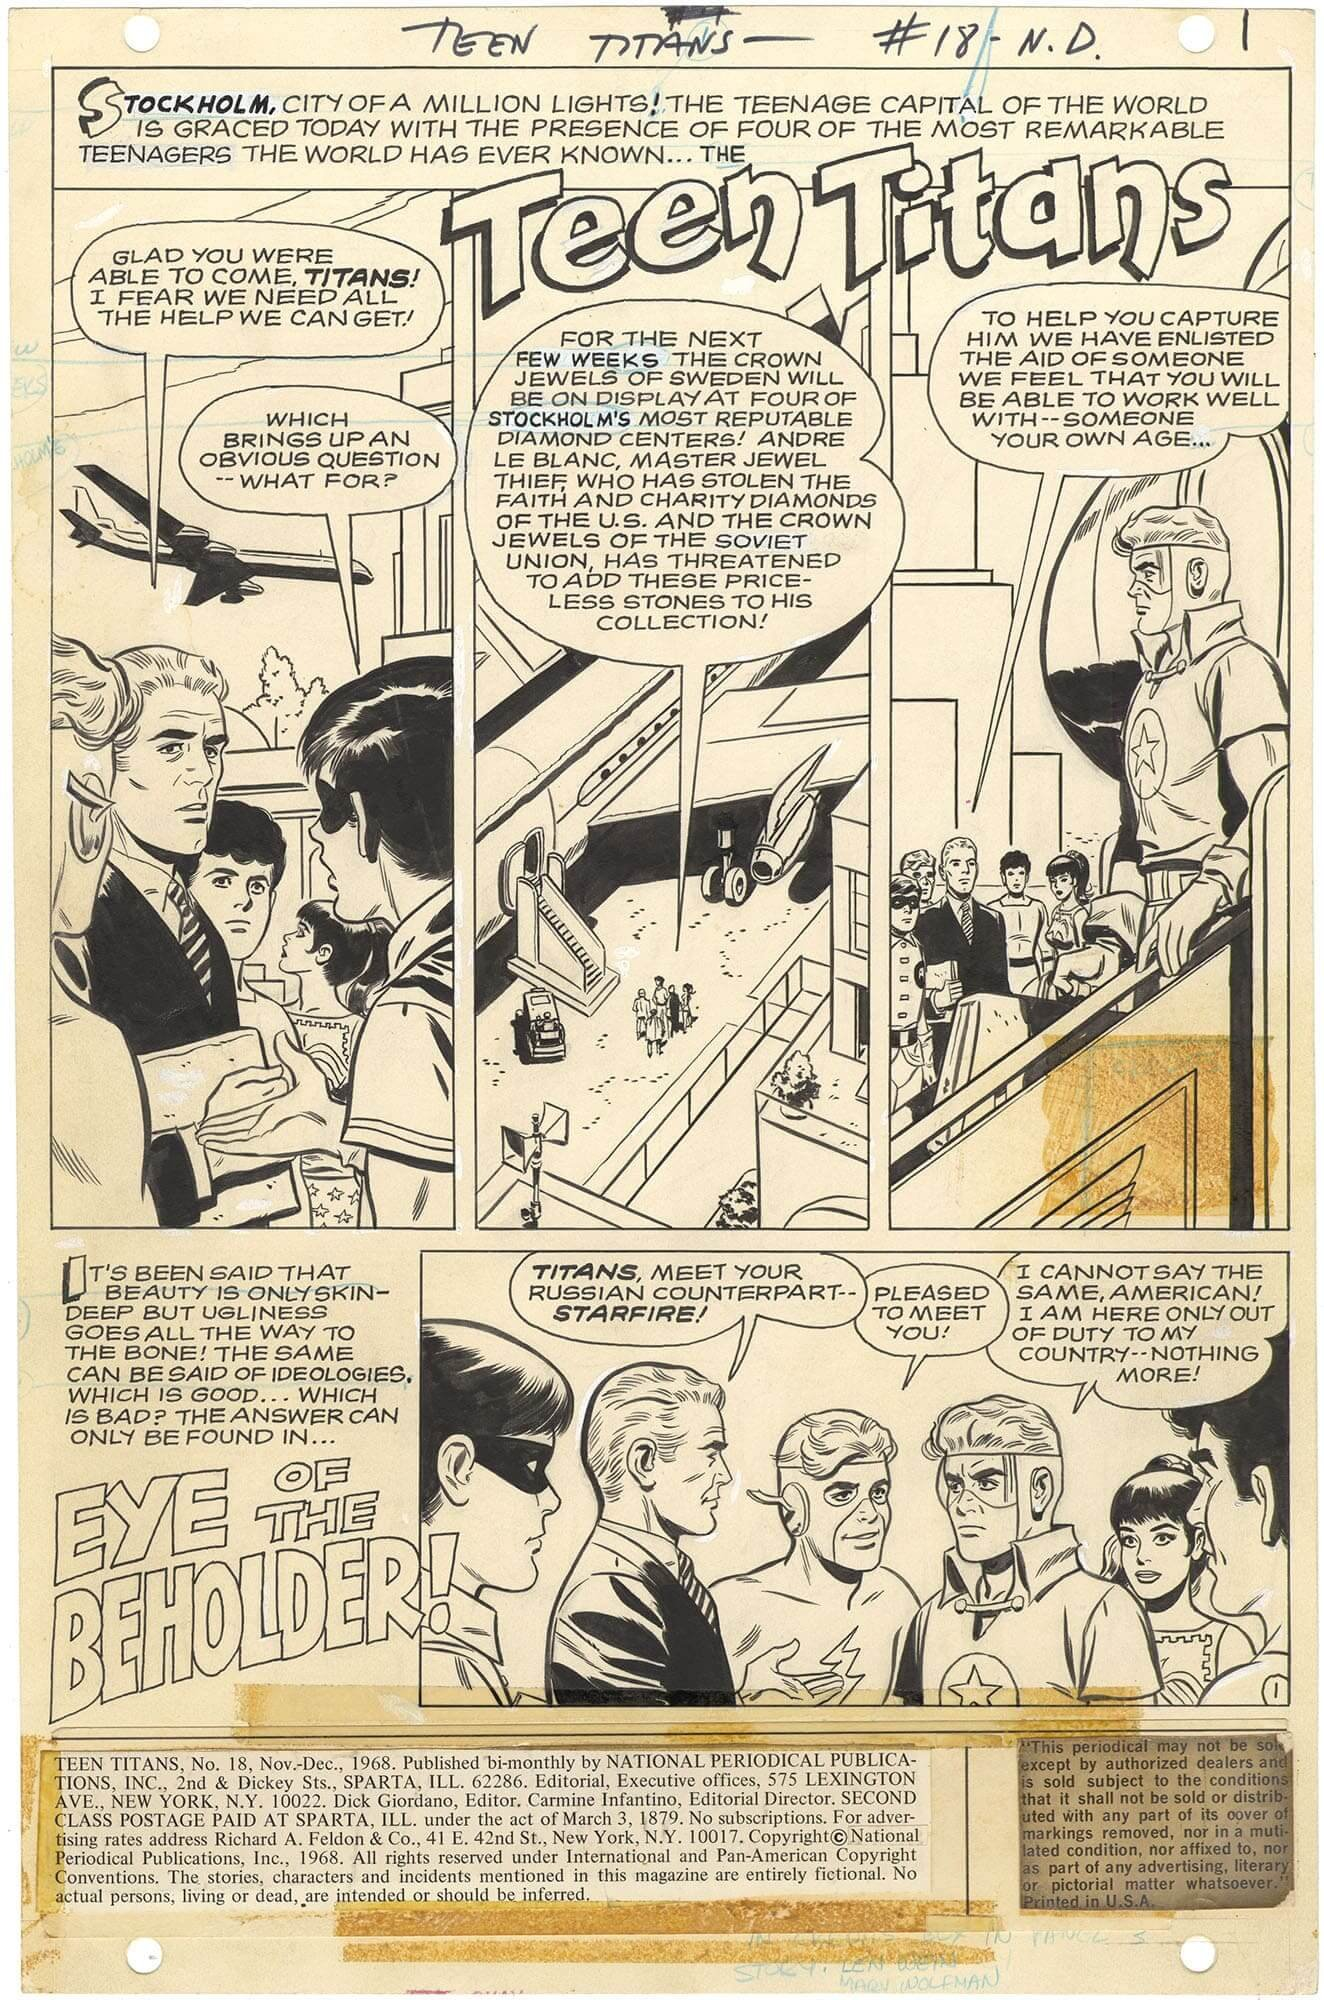 Teen Titans #18 p1